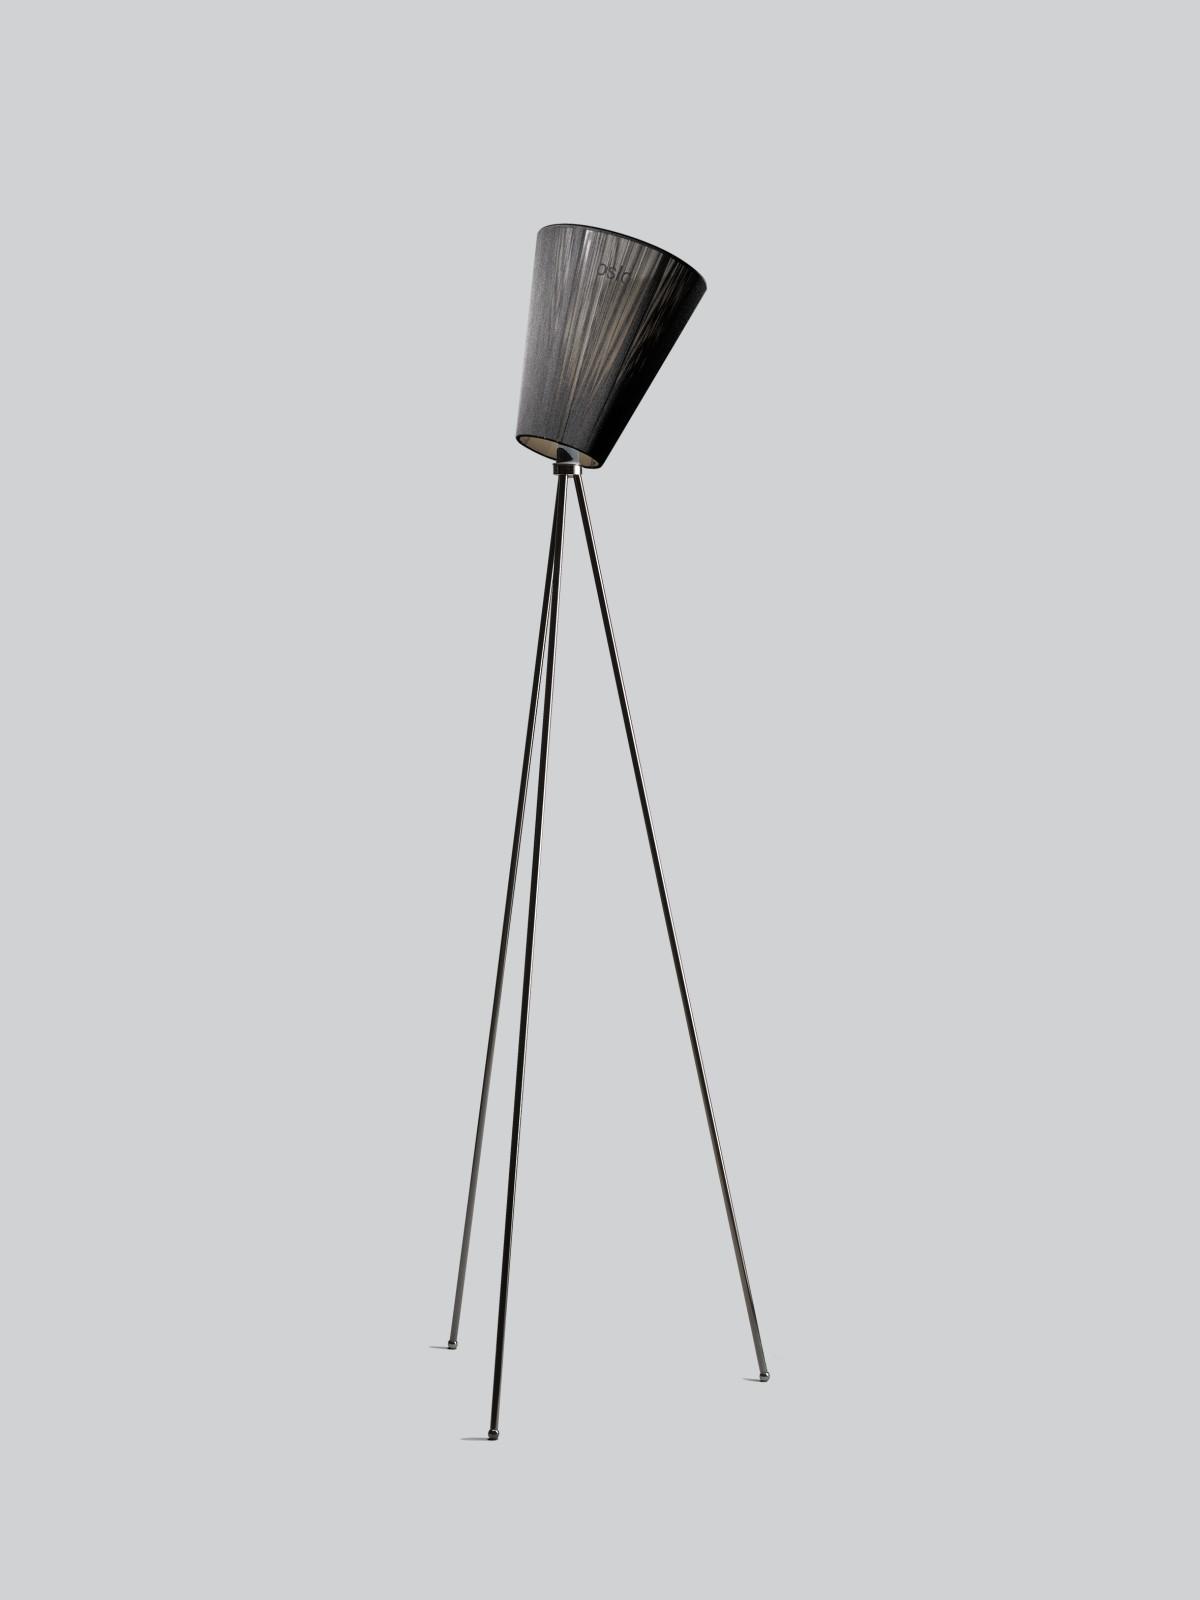 Oslo Wood Floor Lamp Black Shade, Glossy Black Body